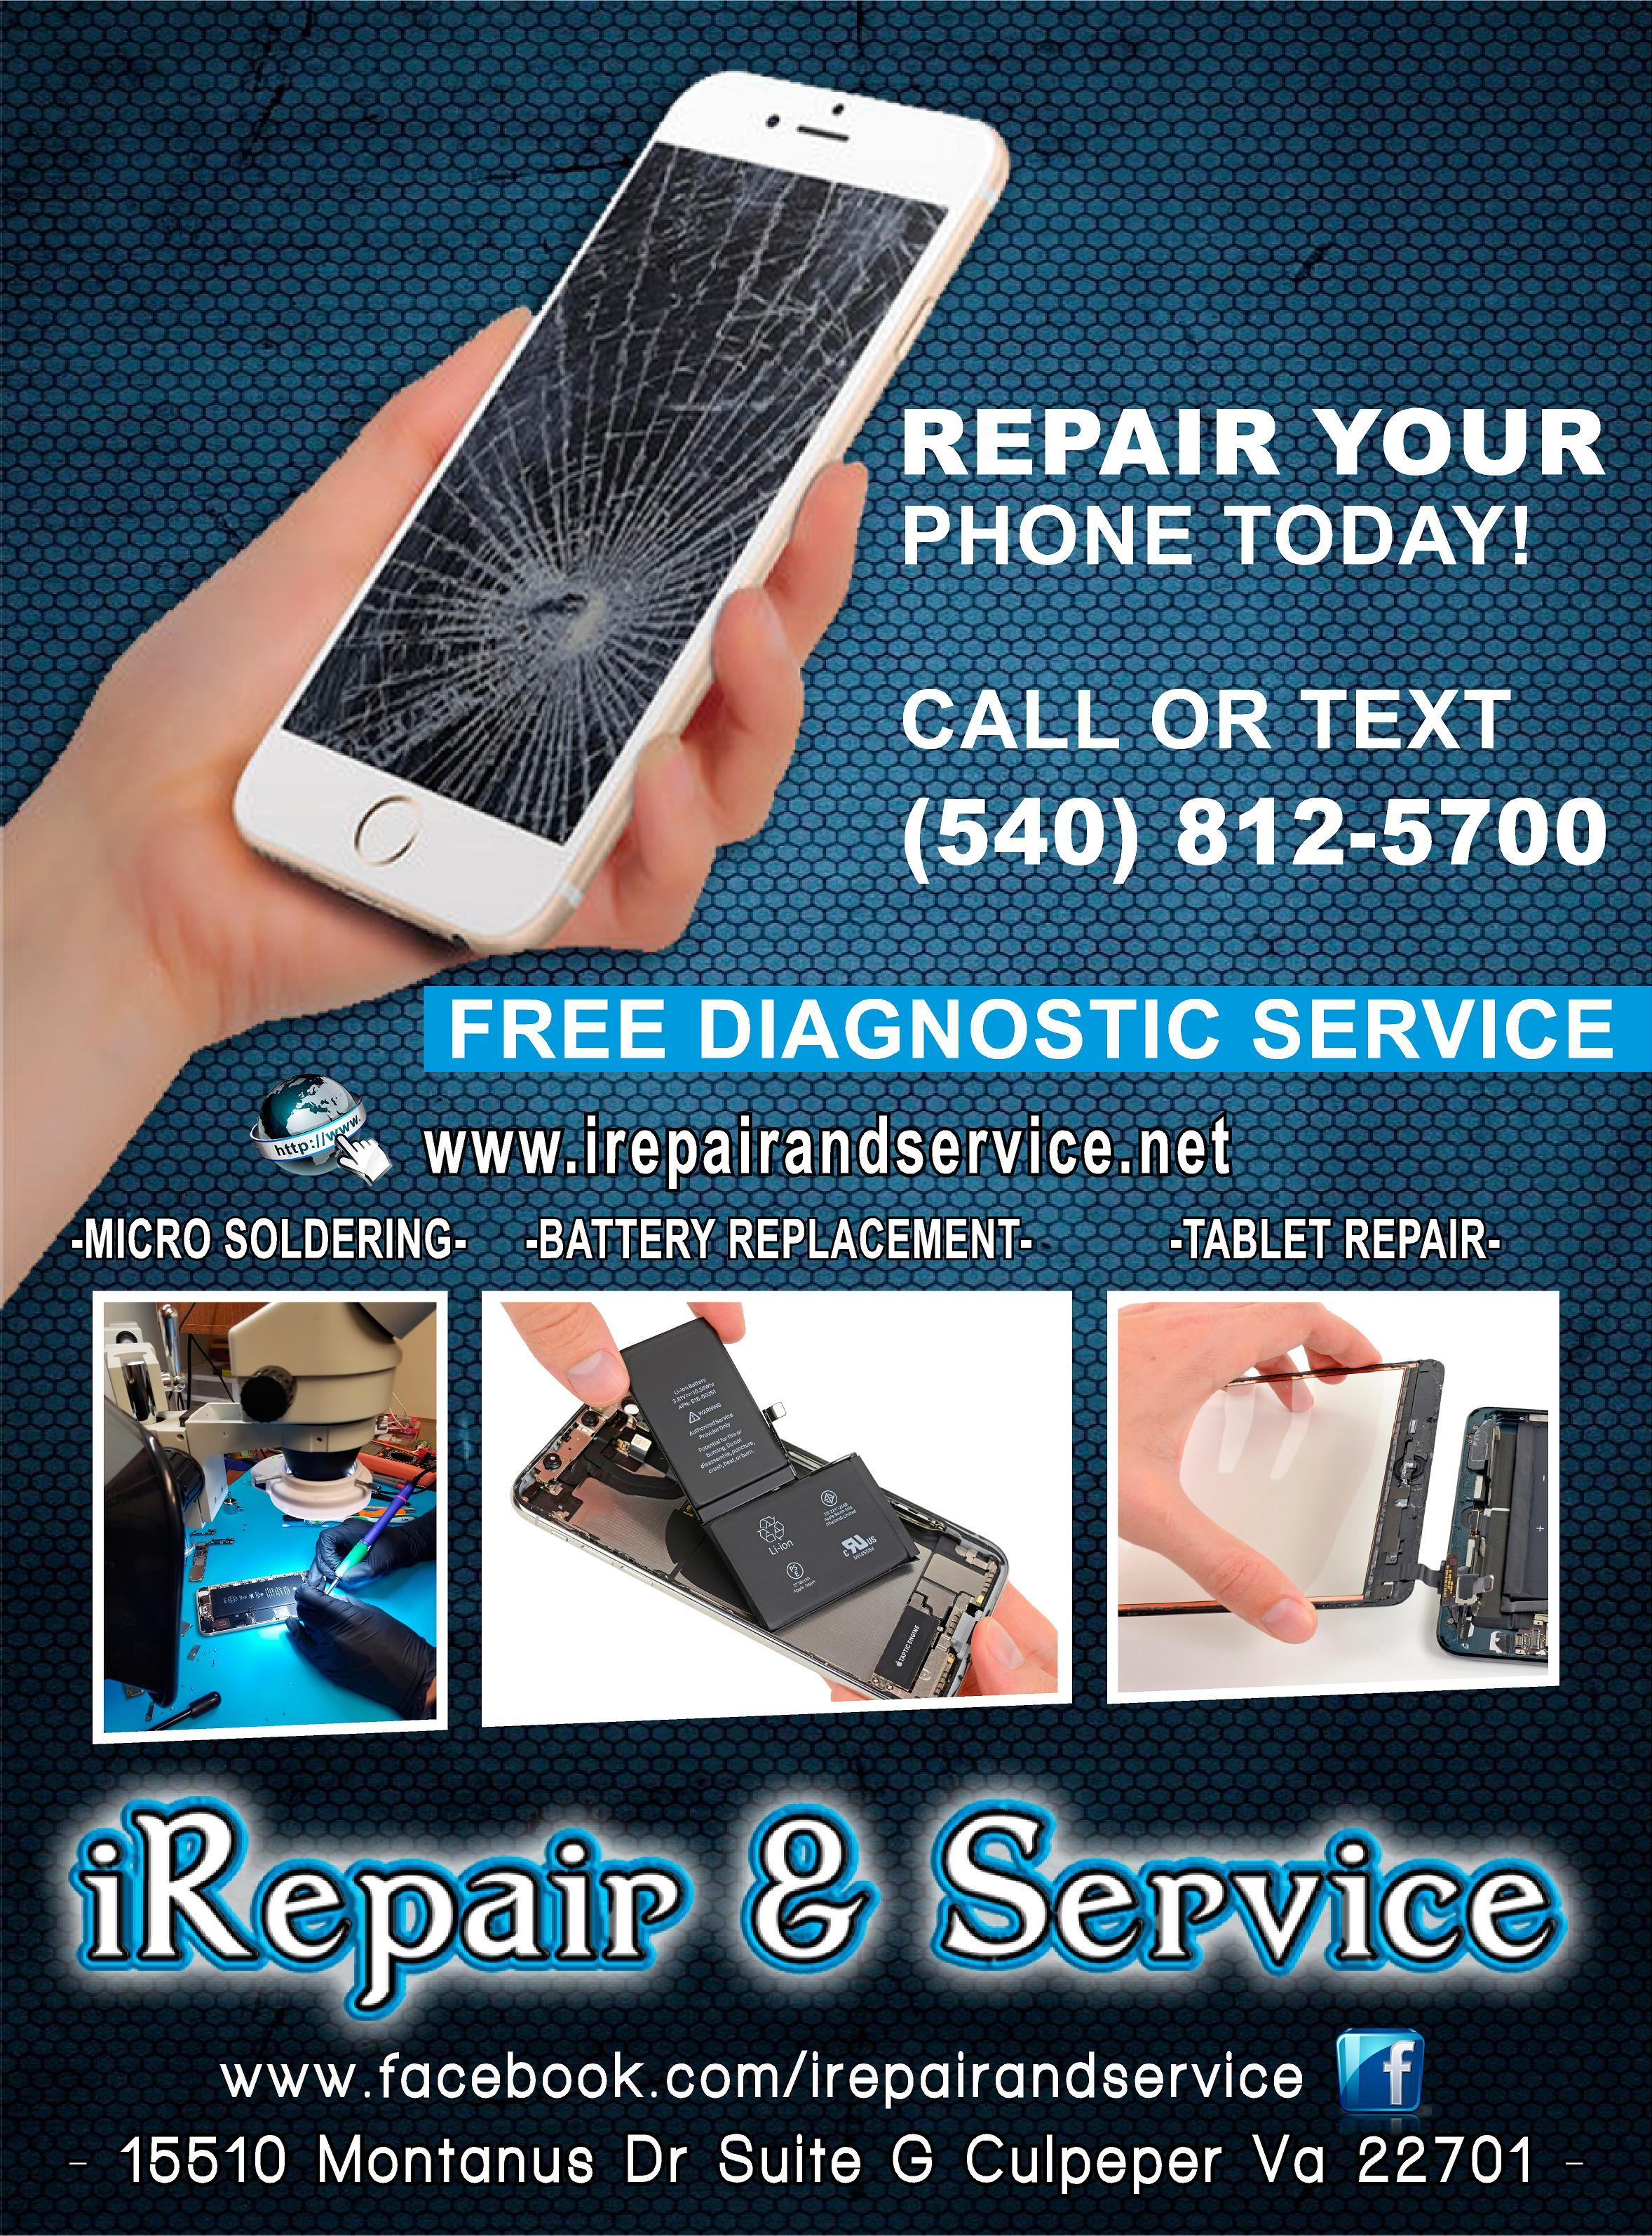 iRepair & Service inc image 2